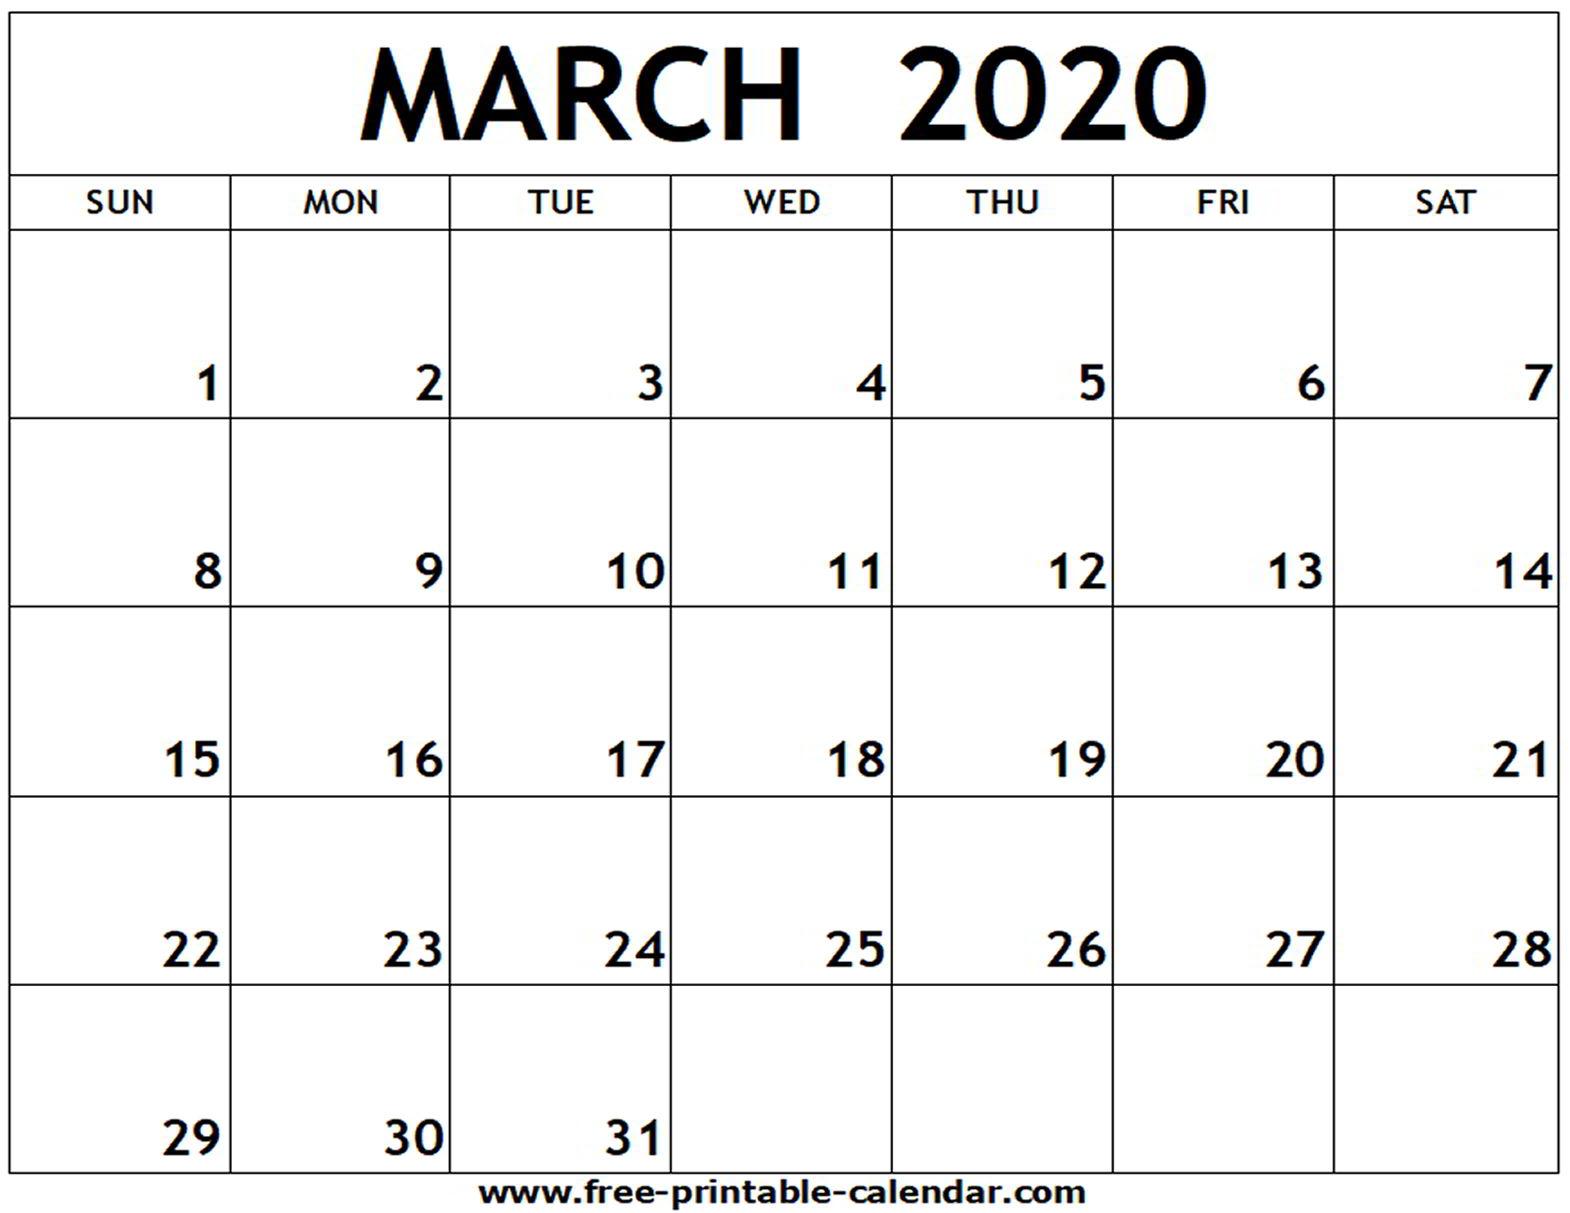 March 2020 Printable Calendar - Free-Printable-Calendar